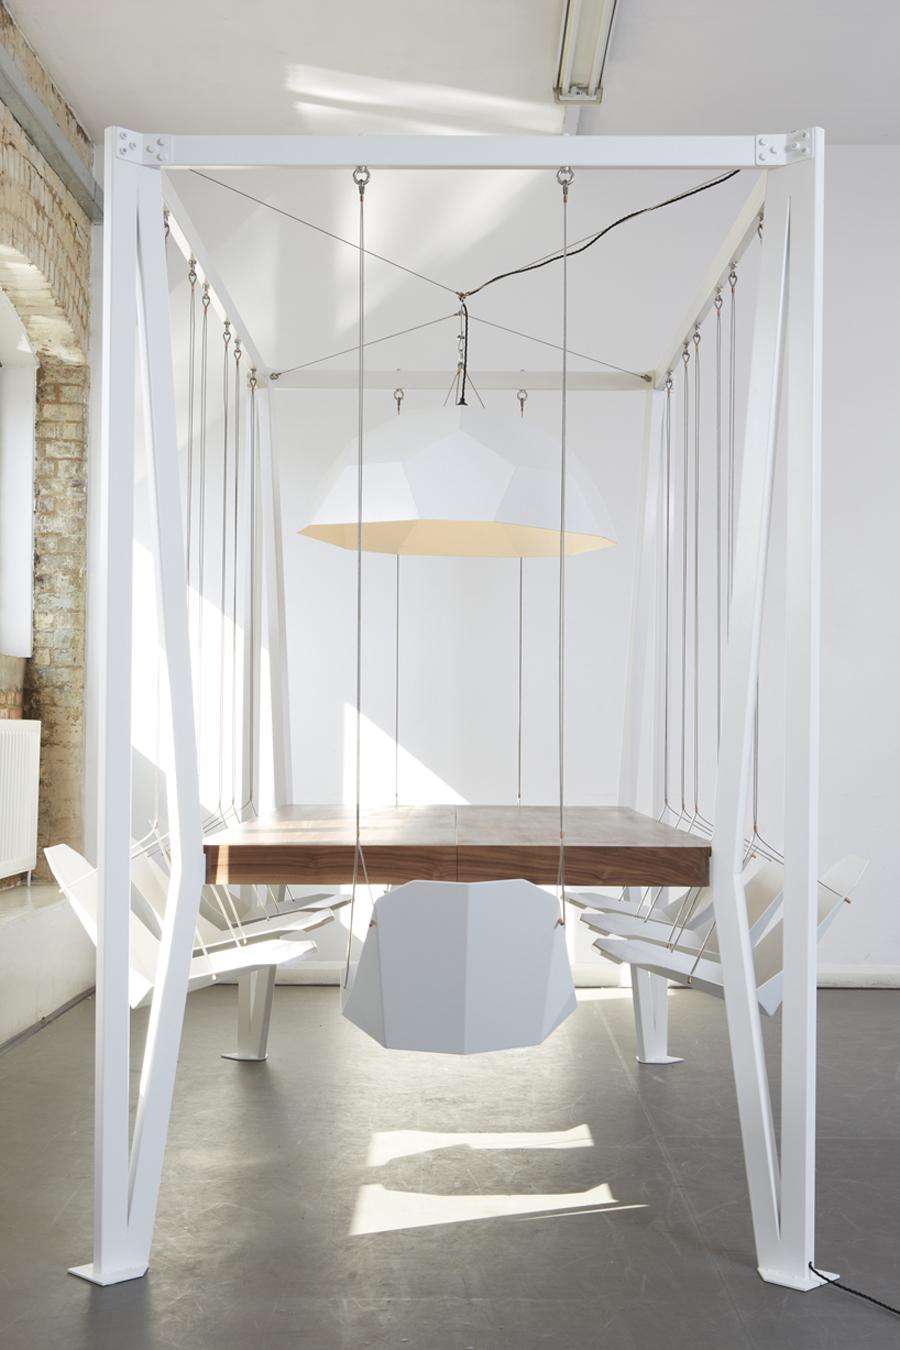 swing-table-duffy-design-studio-london-gessato-3.jpg